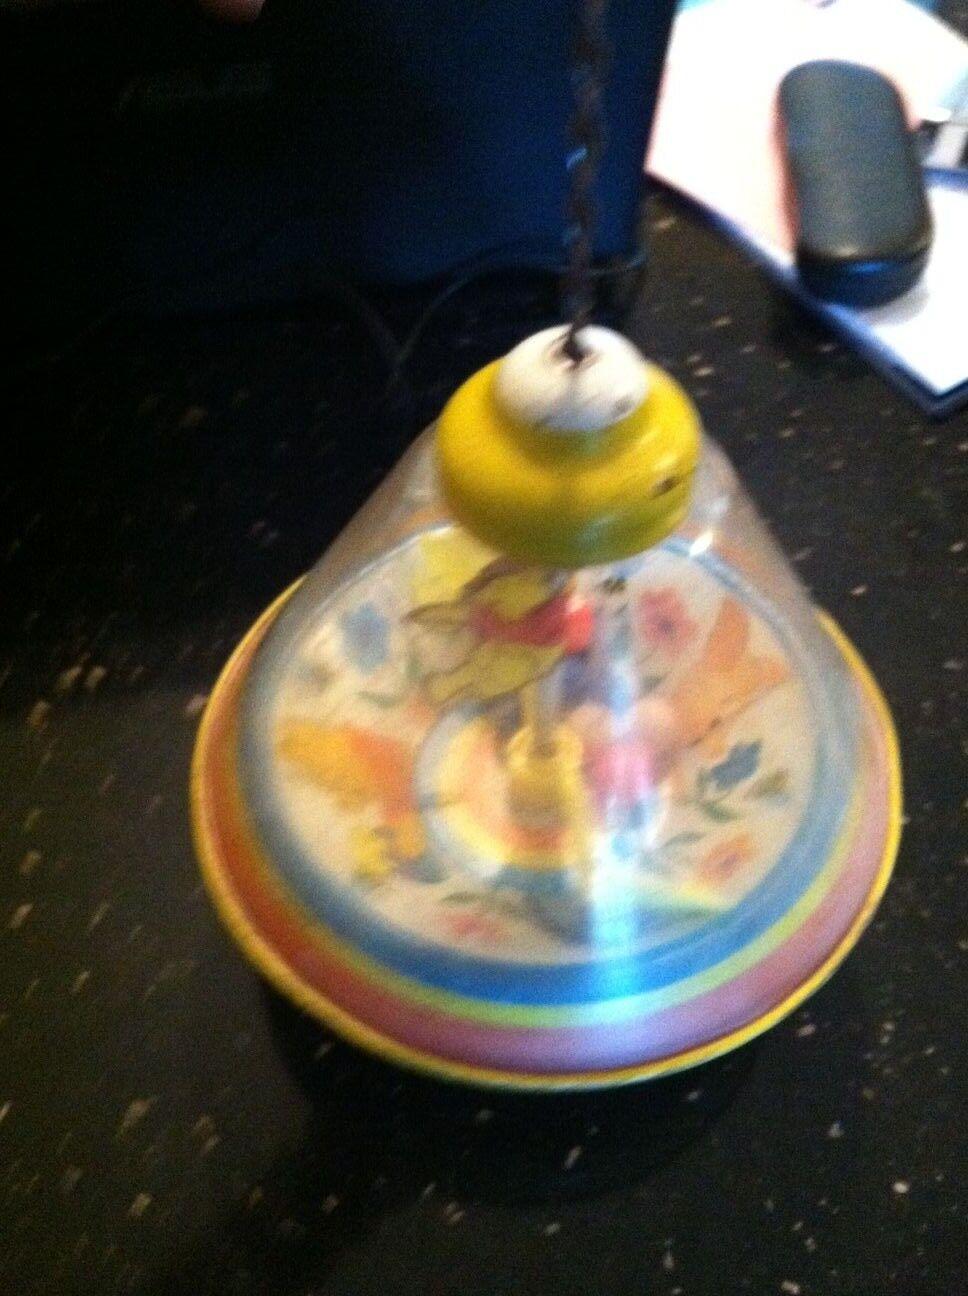 Vintage Rare Spinning Top-Ohio Art- Art- Art- Spiral Winnie the Pooh with balls 438e95